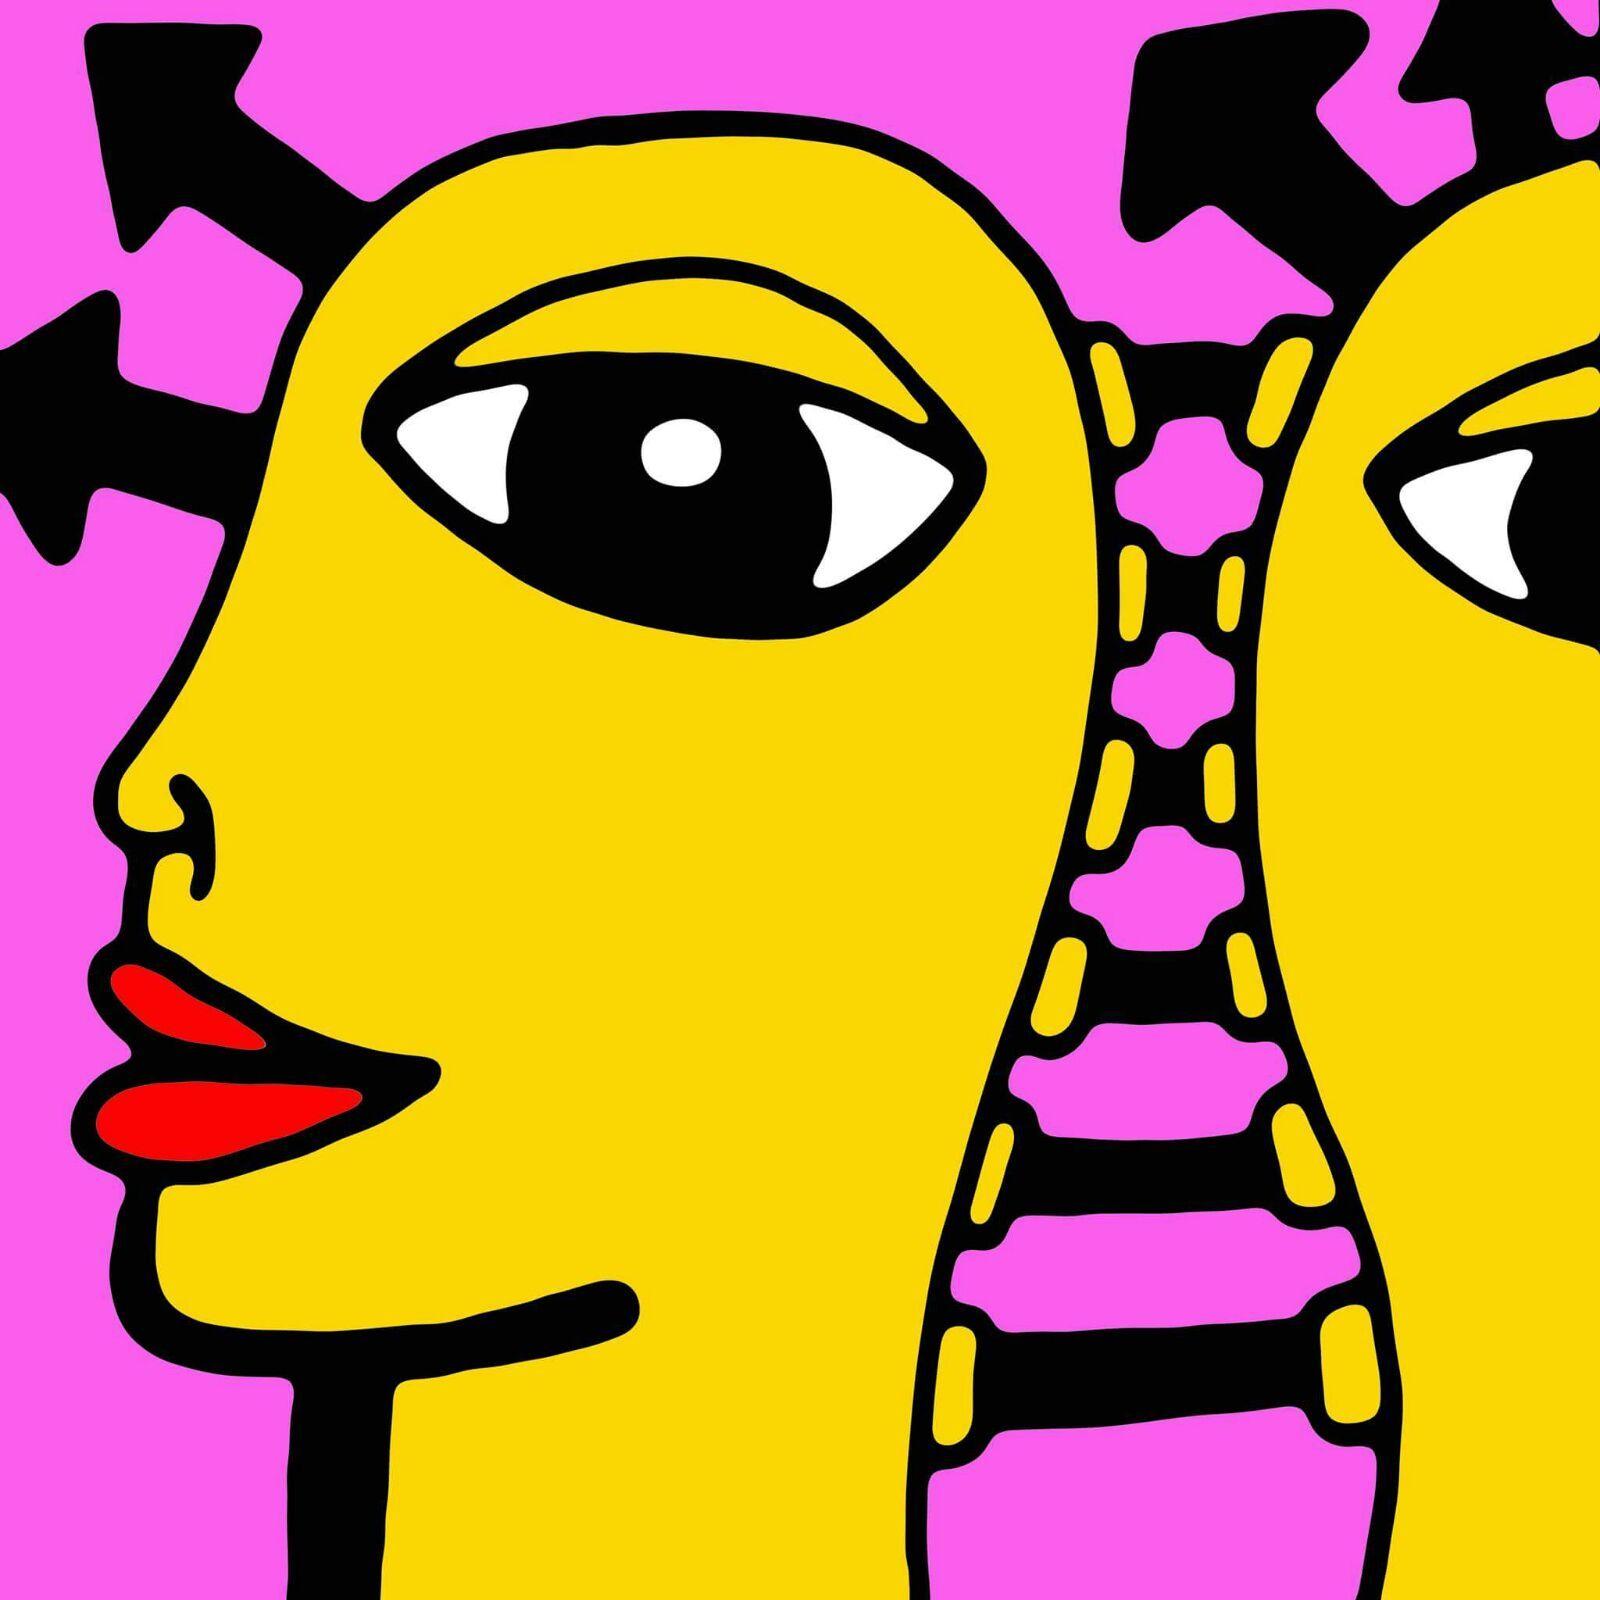 Marc craig london street artist digital colour print on